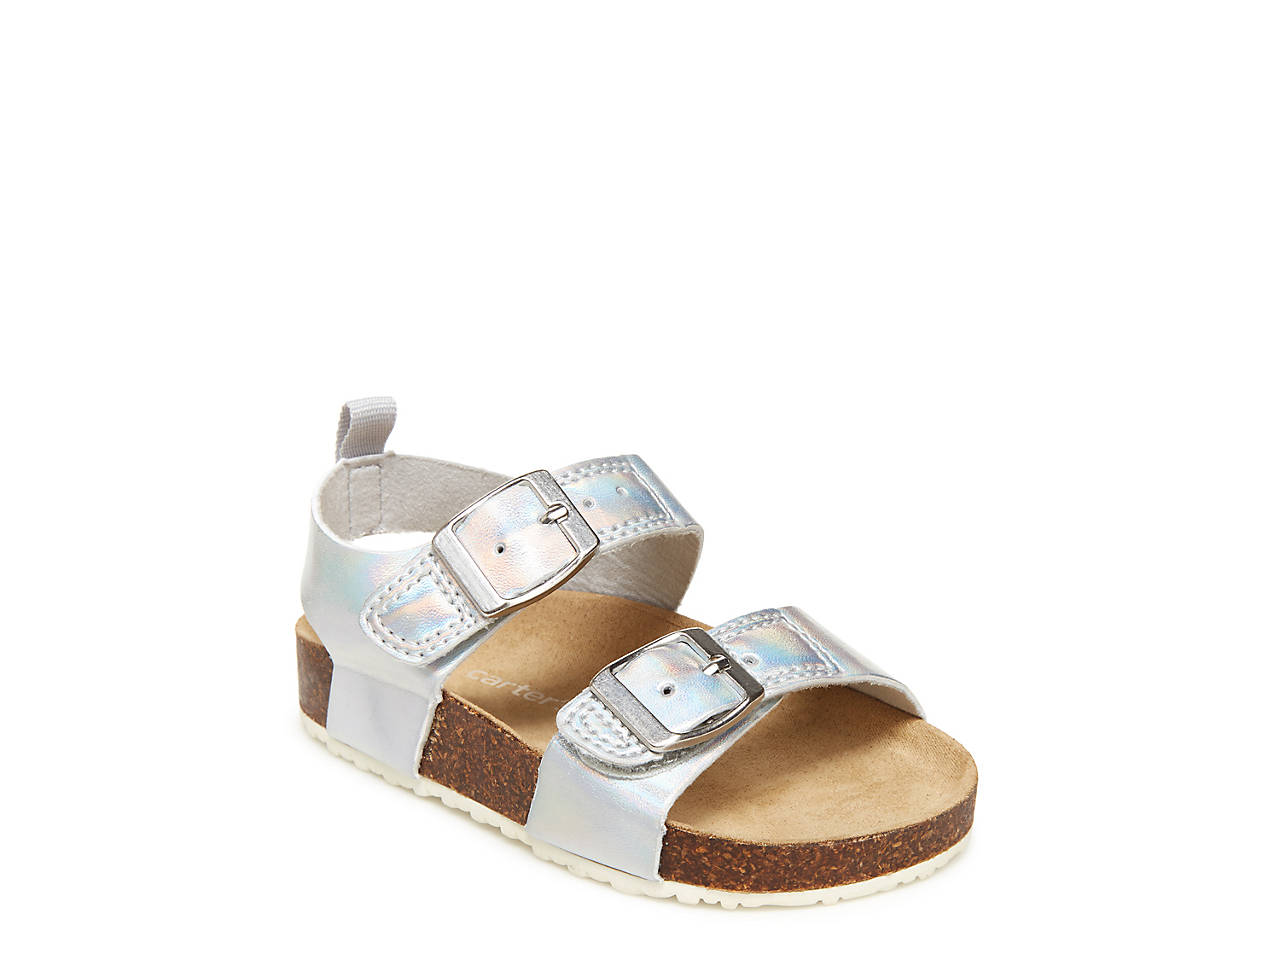 64e451d6f Carter s Duncan Toddler Sandal Kids Shoes